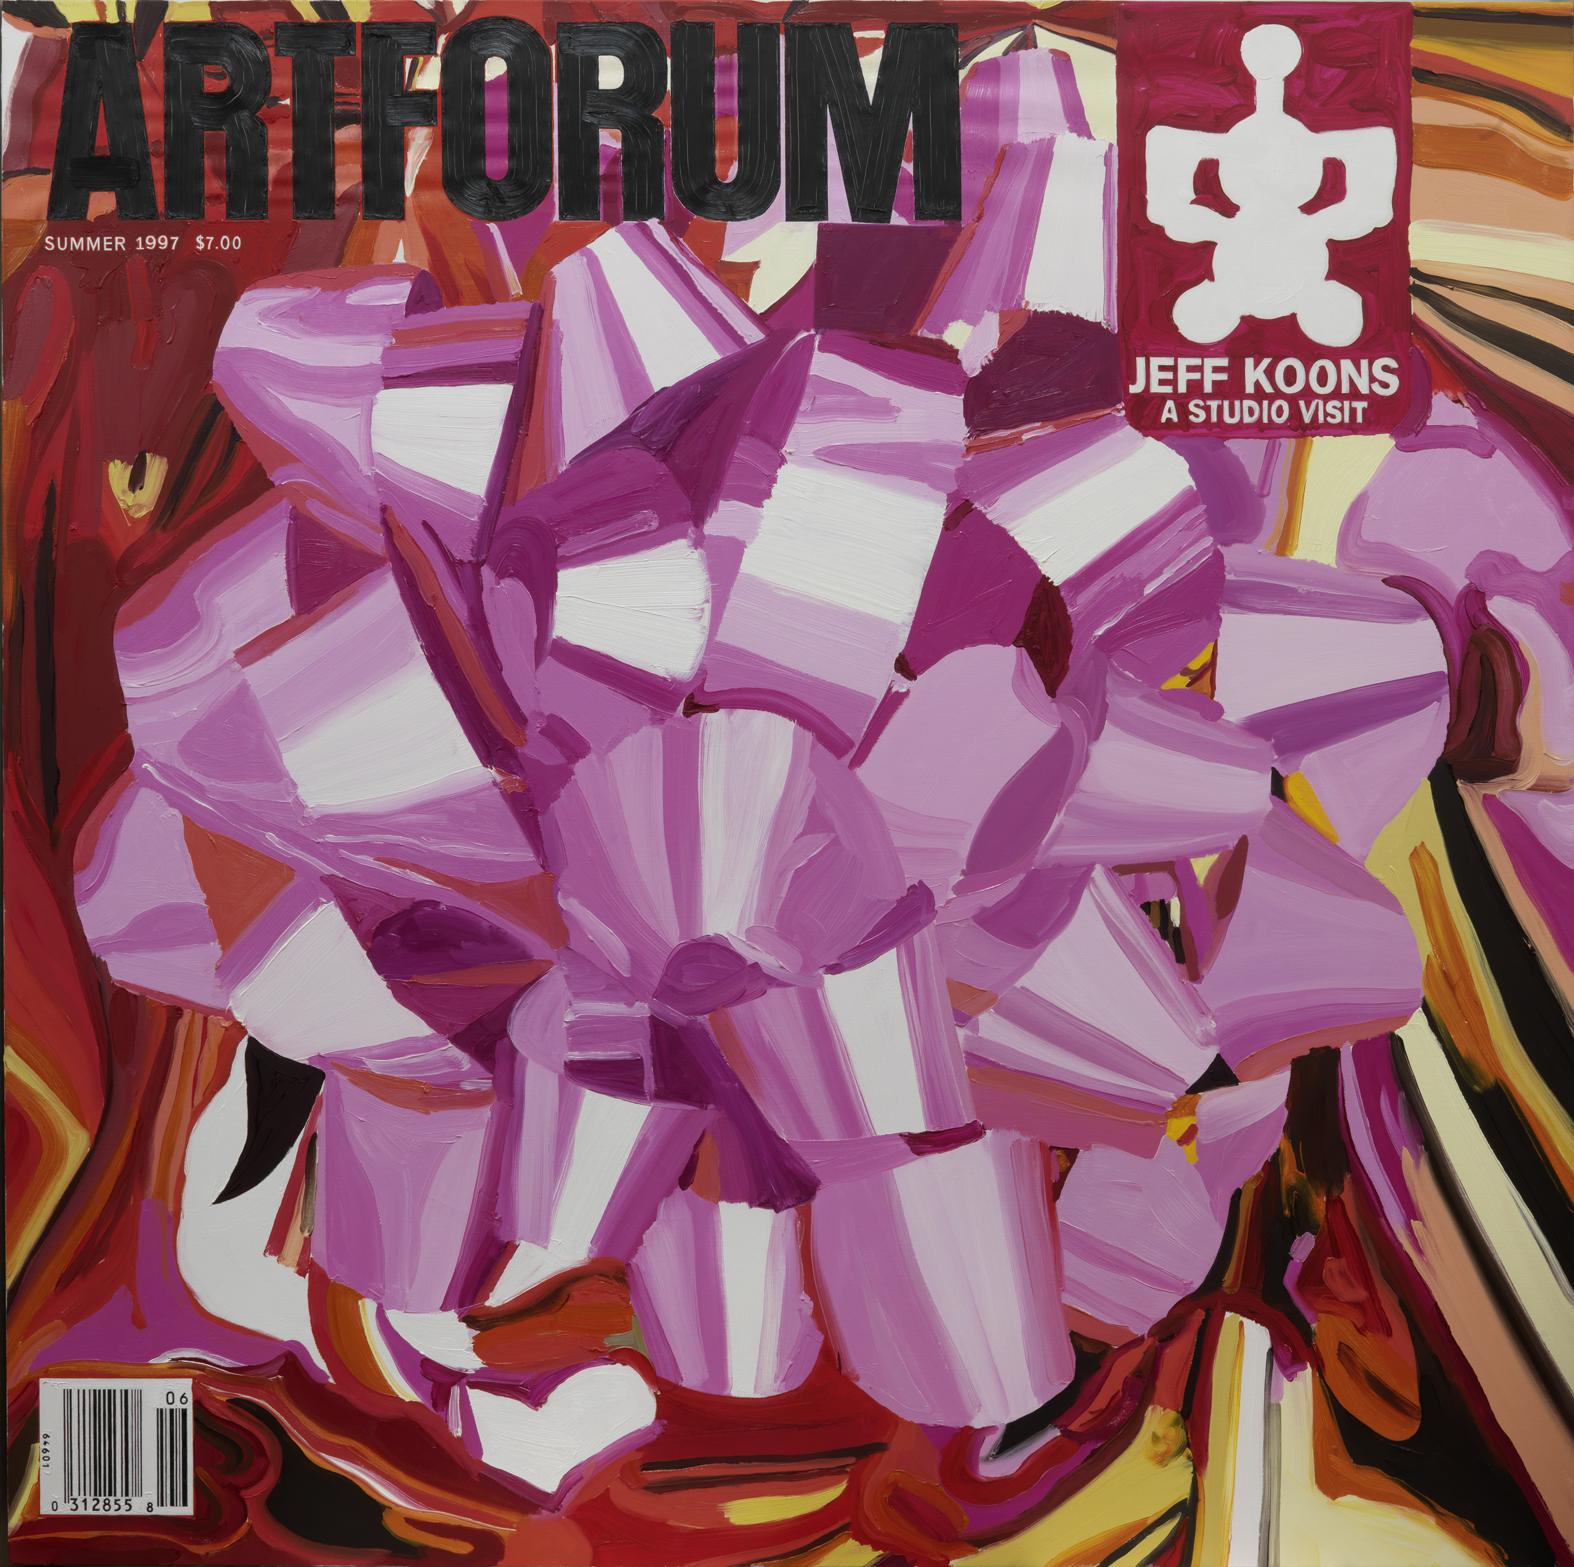 Artforum Summer 2007, 72ins x 72ins, Oil on linen, 1998.